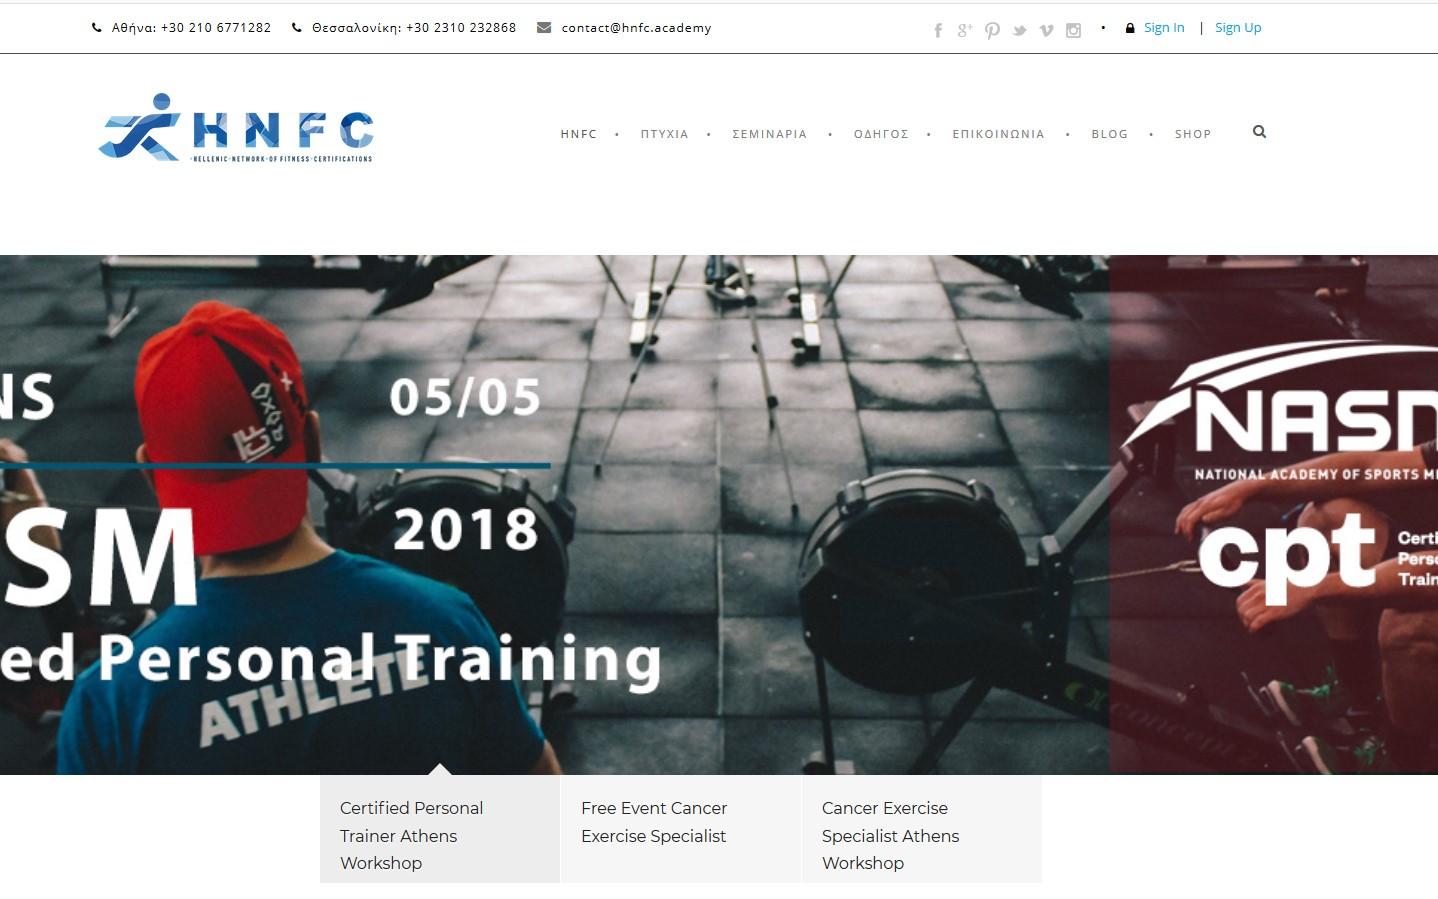 HNFC Academy - Κατασκευή ιστοσελίδας σε WordPress